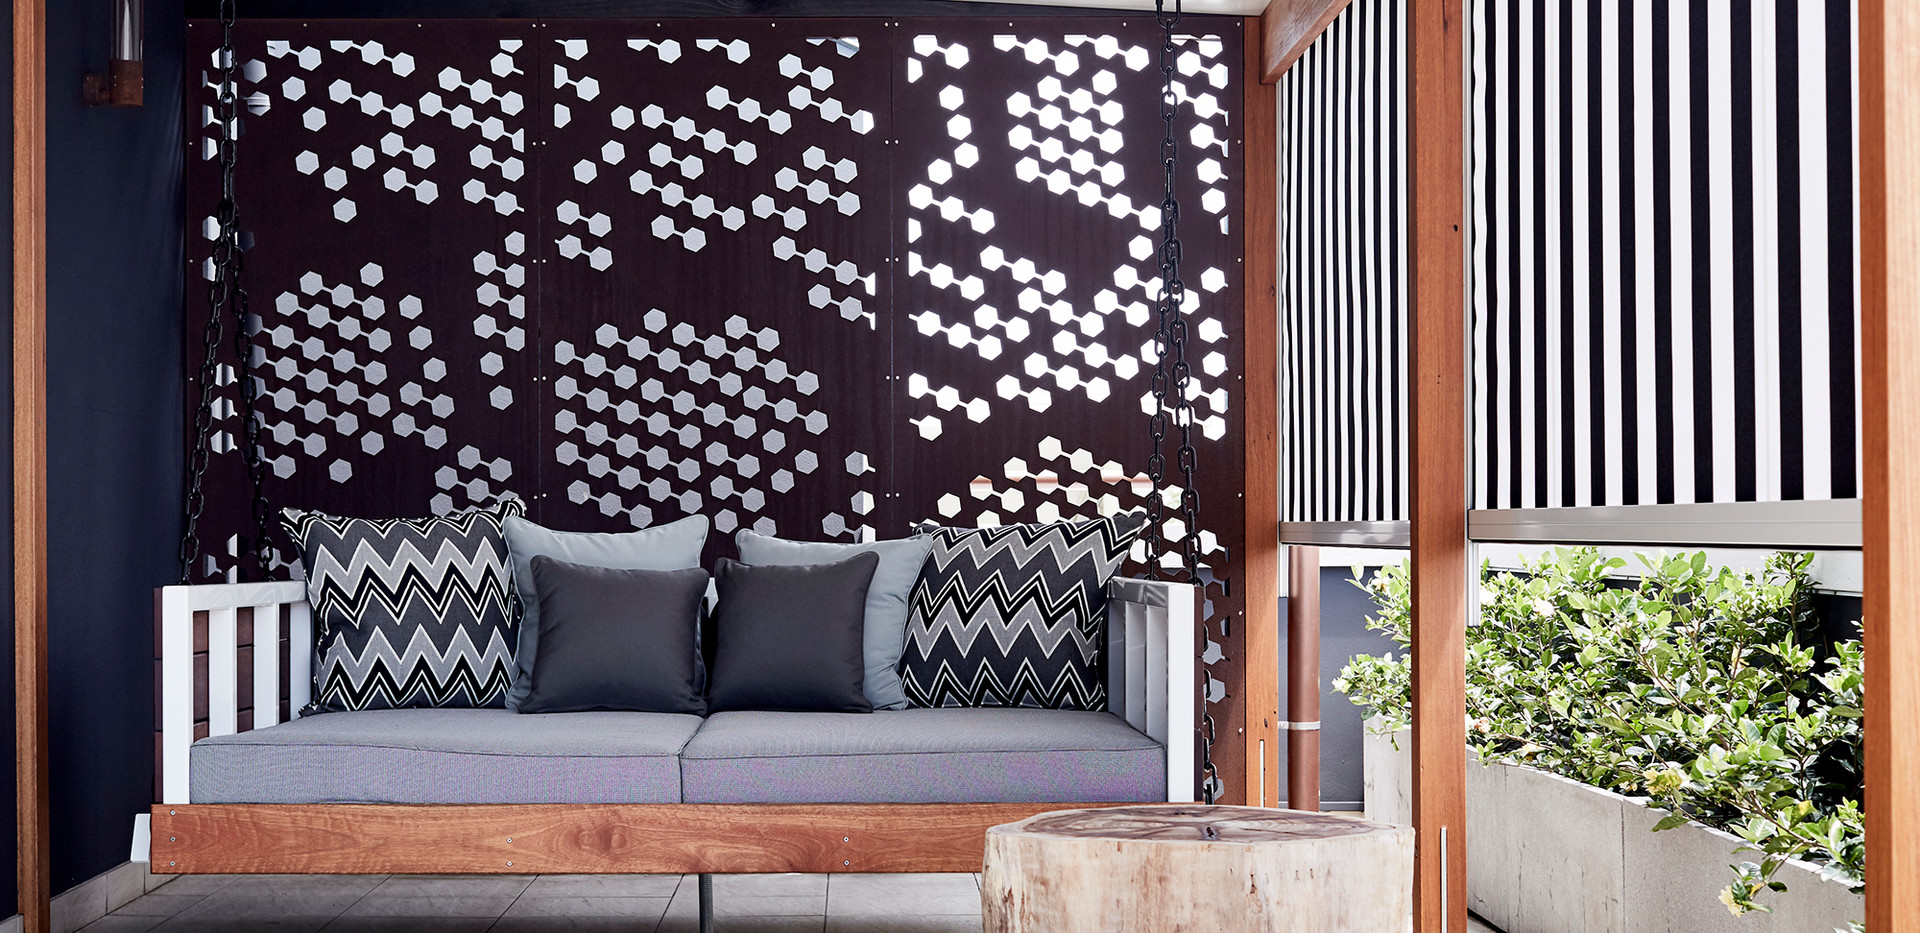 Rooftop Boutique Accomodation Interior Design & Decoration